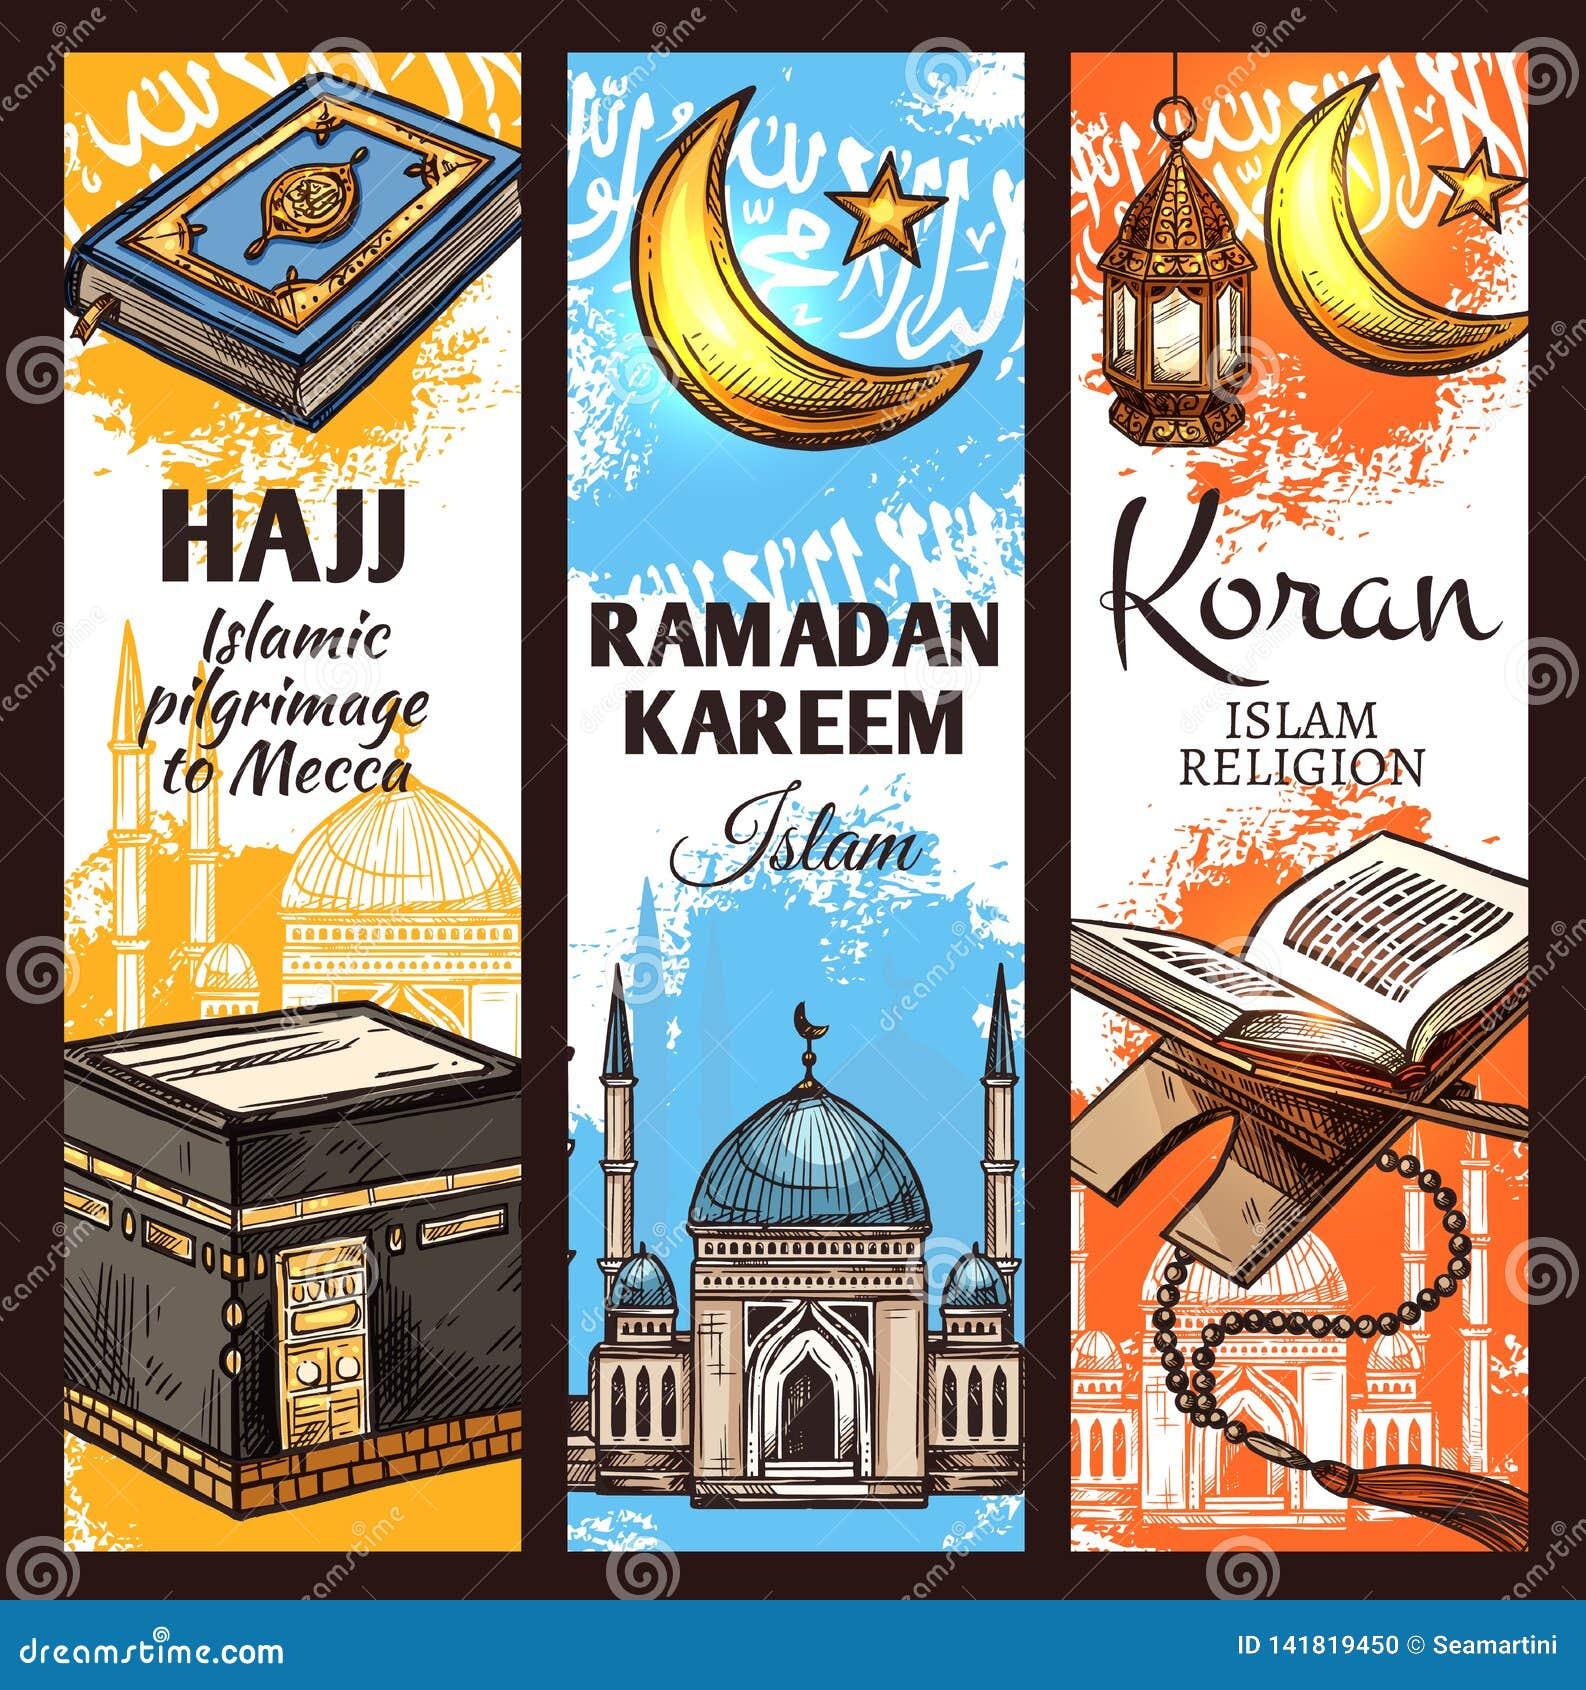 Moschea musulmana, lanterna del Ramadan e Corano islamico